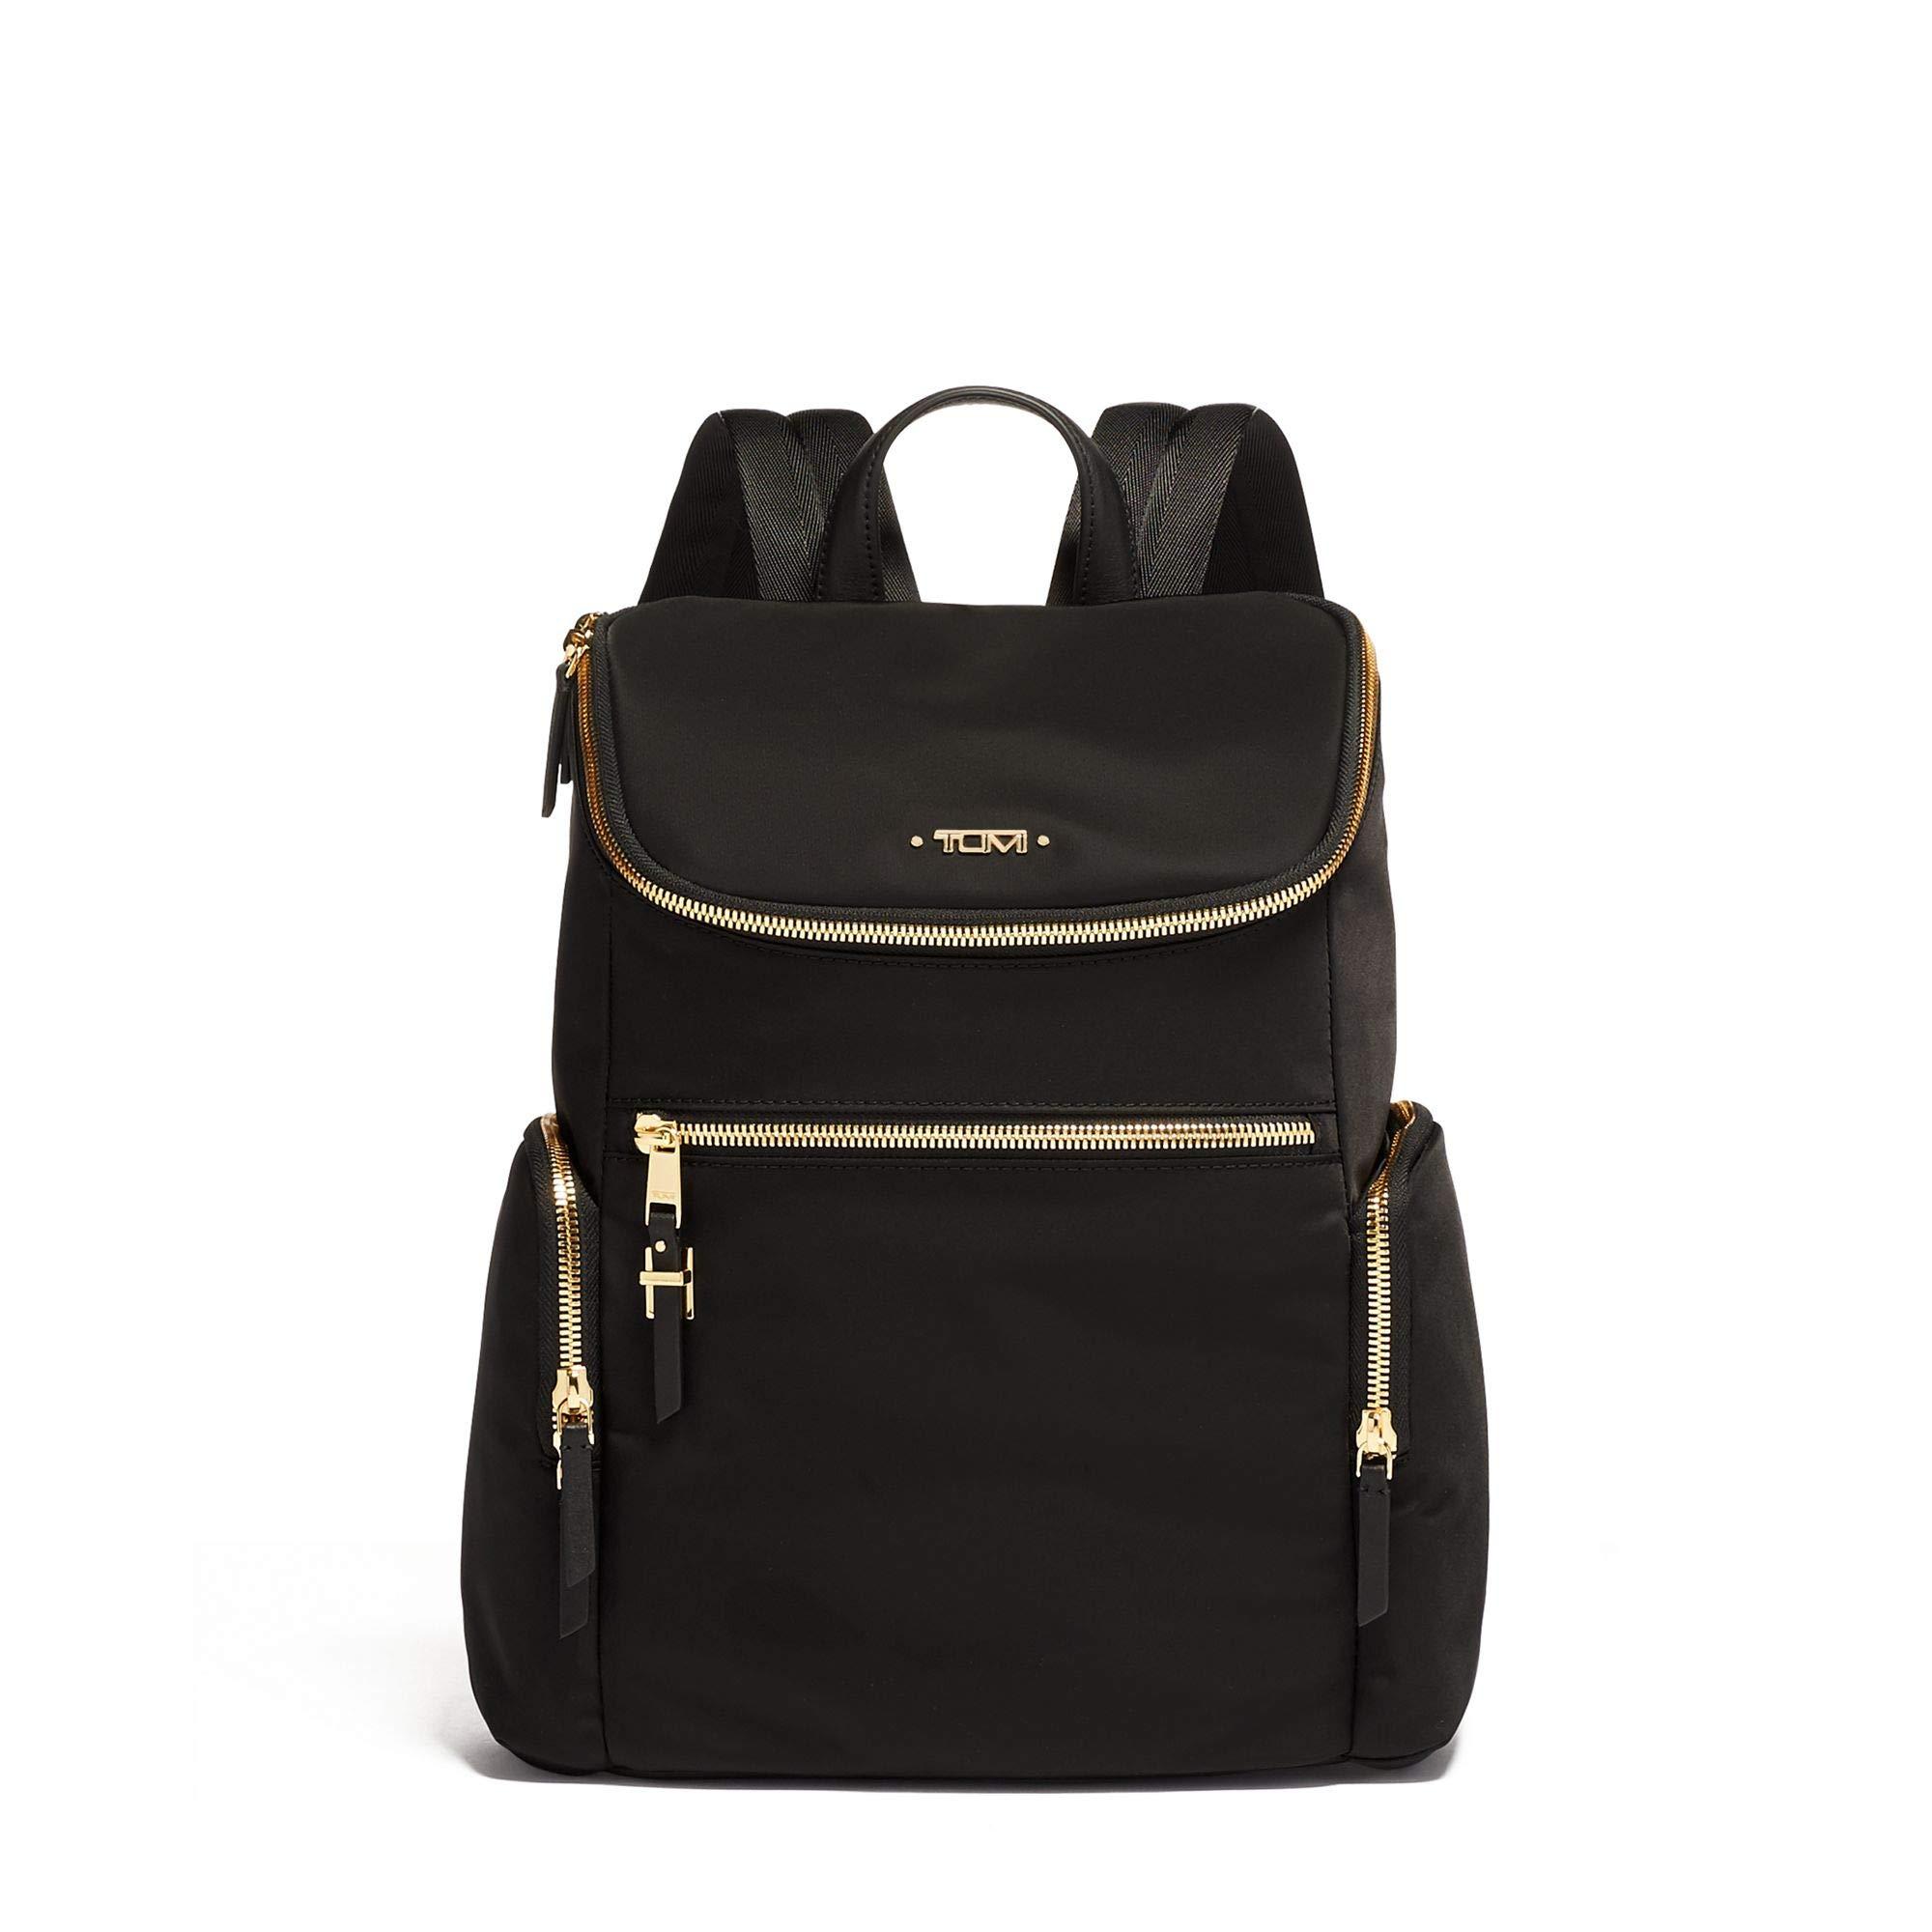 Tumi Women's Voyageur Bethany Backpack Black One Size